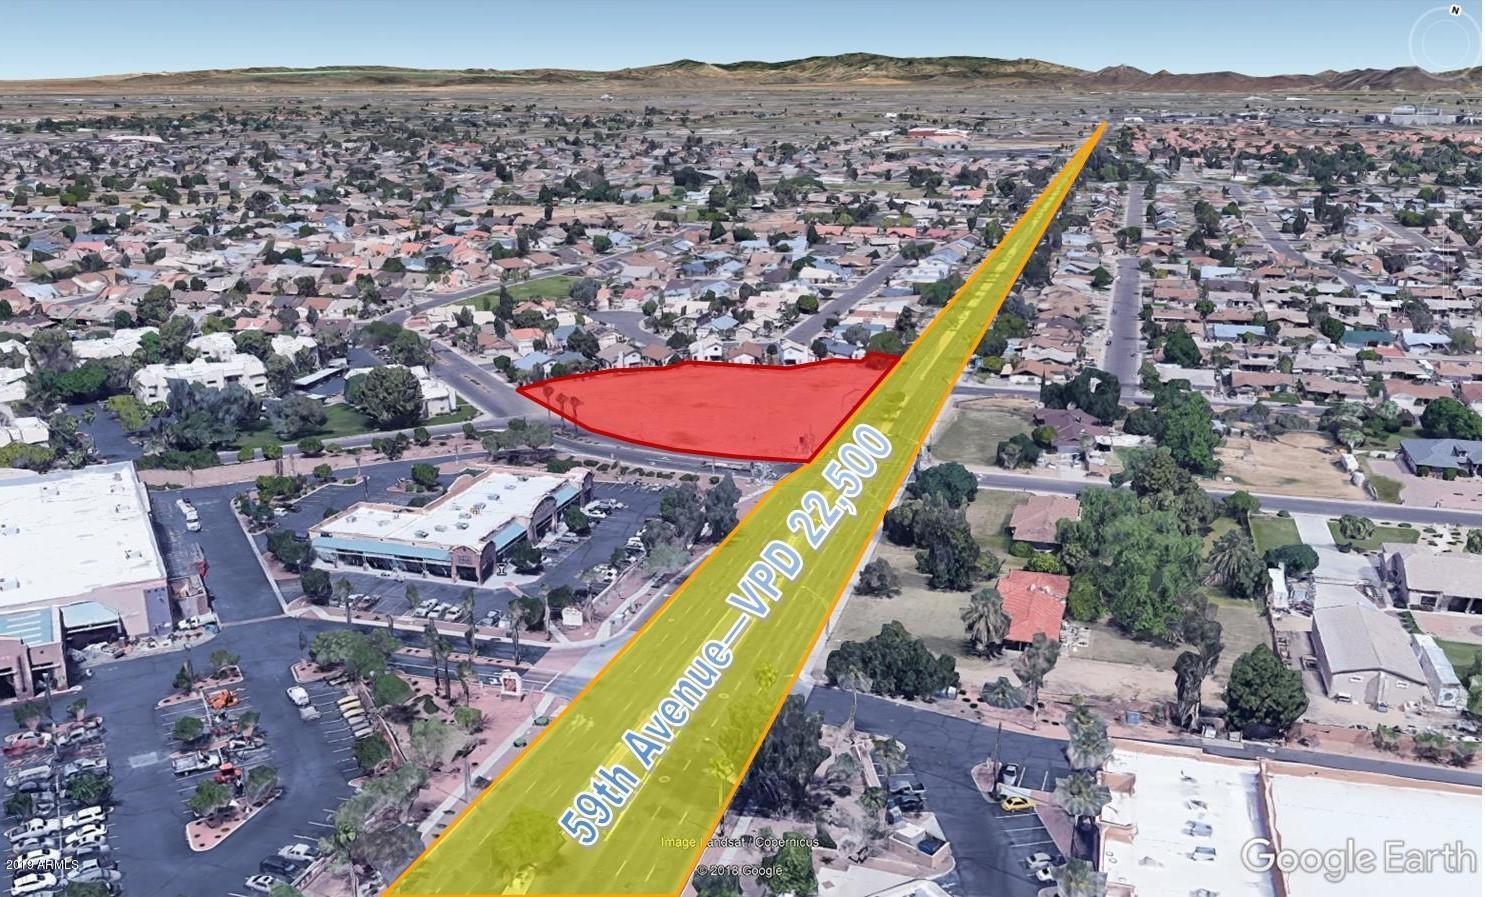 Photo of NW Mercer Ln & 59th Avenue, Glendale, AZ 85302